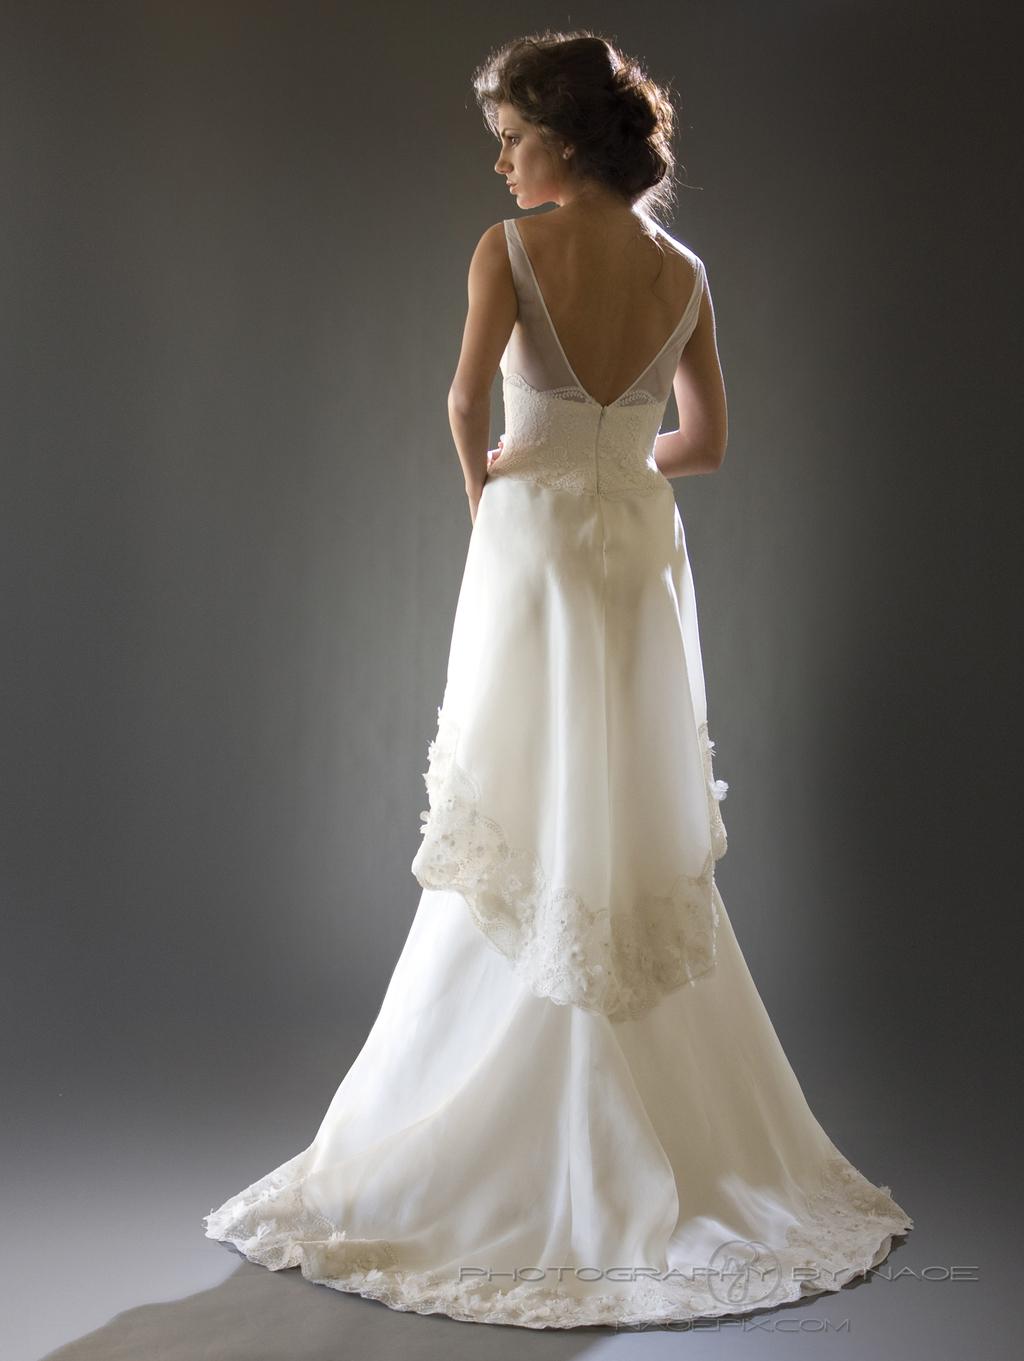 Wedding-dress-spring-2013-bridal_gown-cocoe-voci-7-back.full